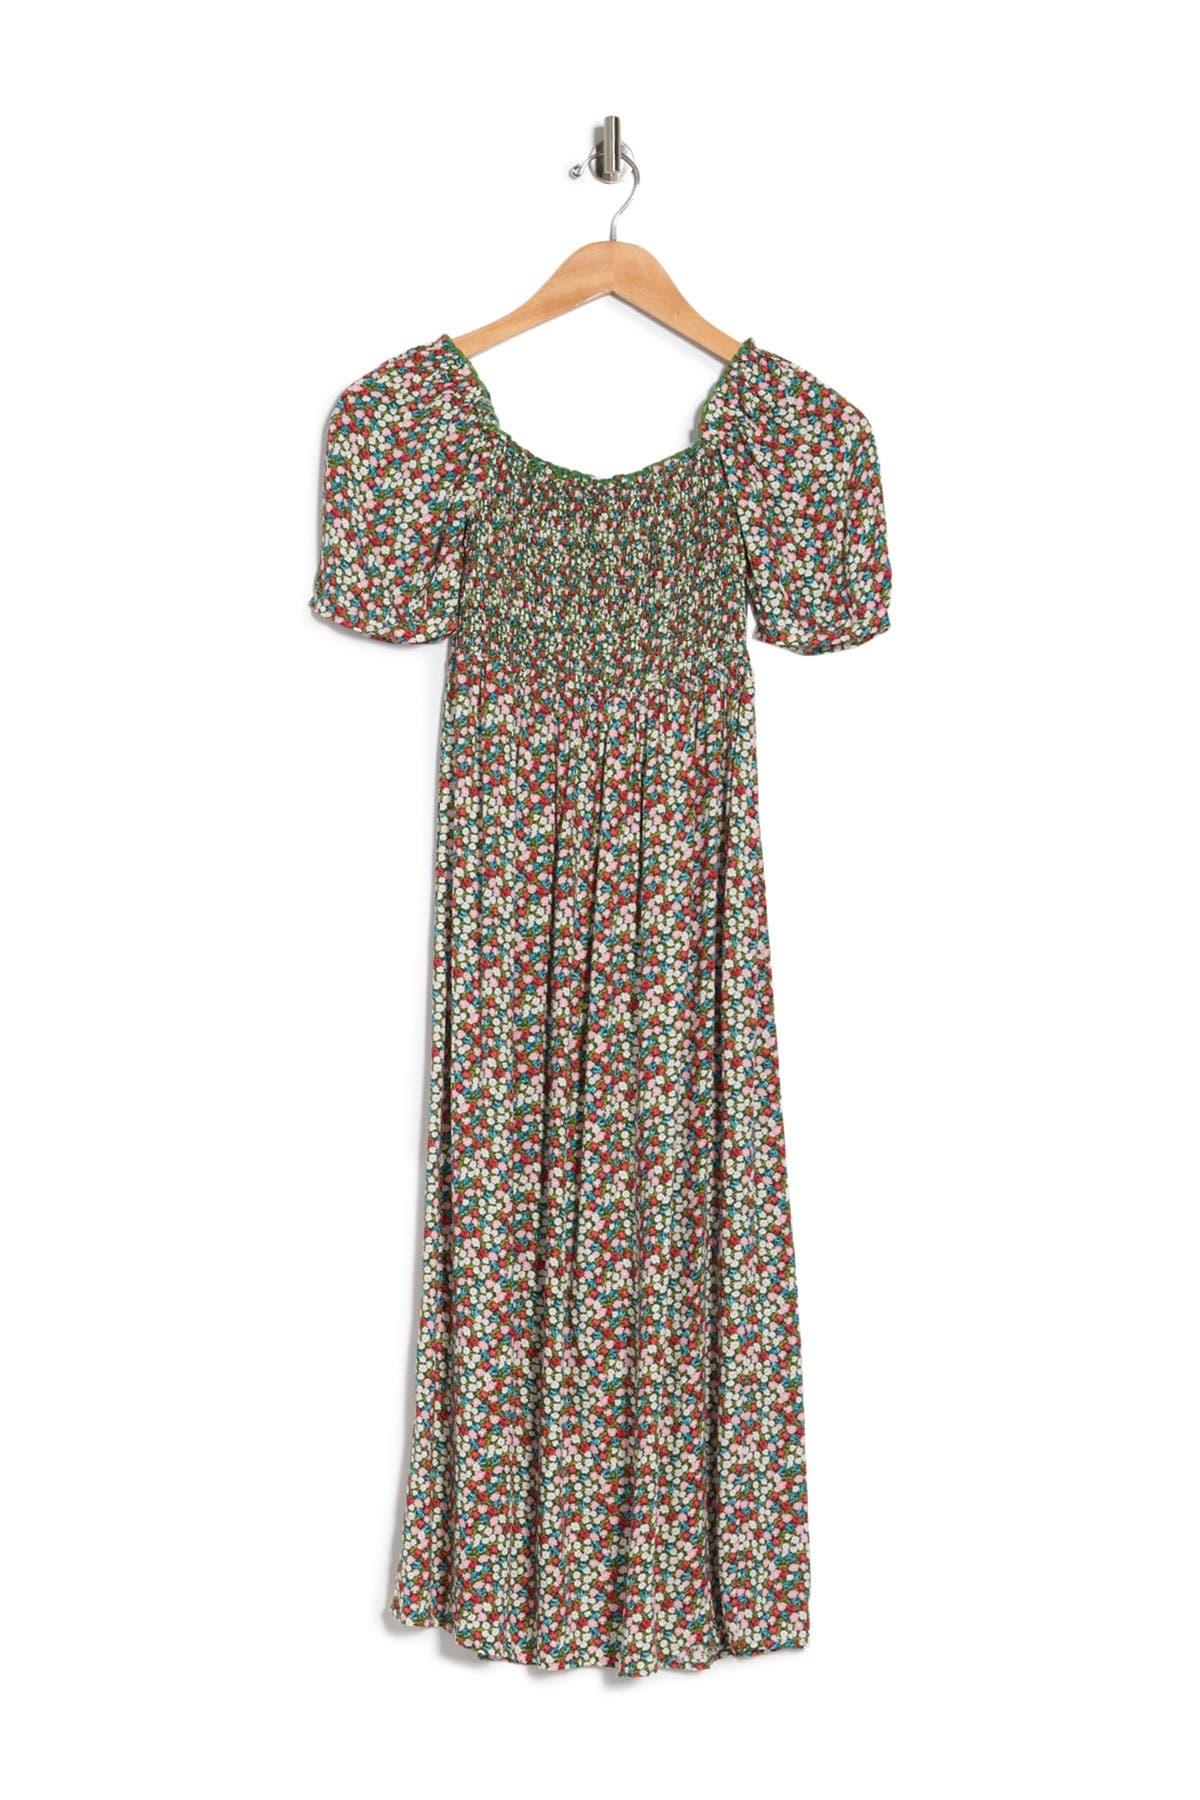 Image of Velvet Torch Puff Sleeve Smocked Floral Dress